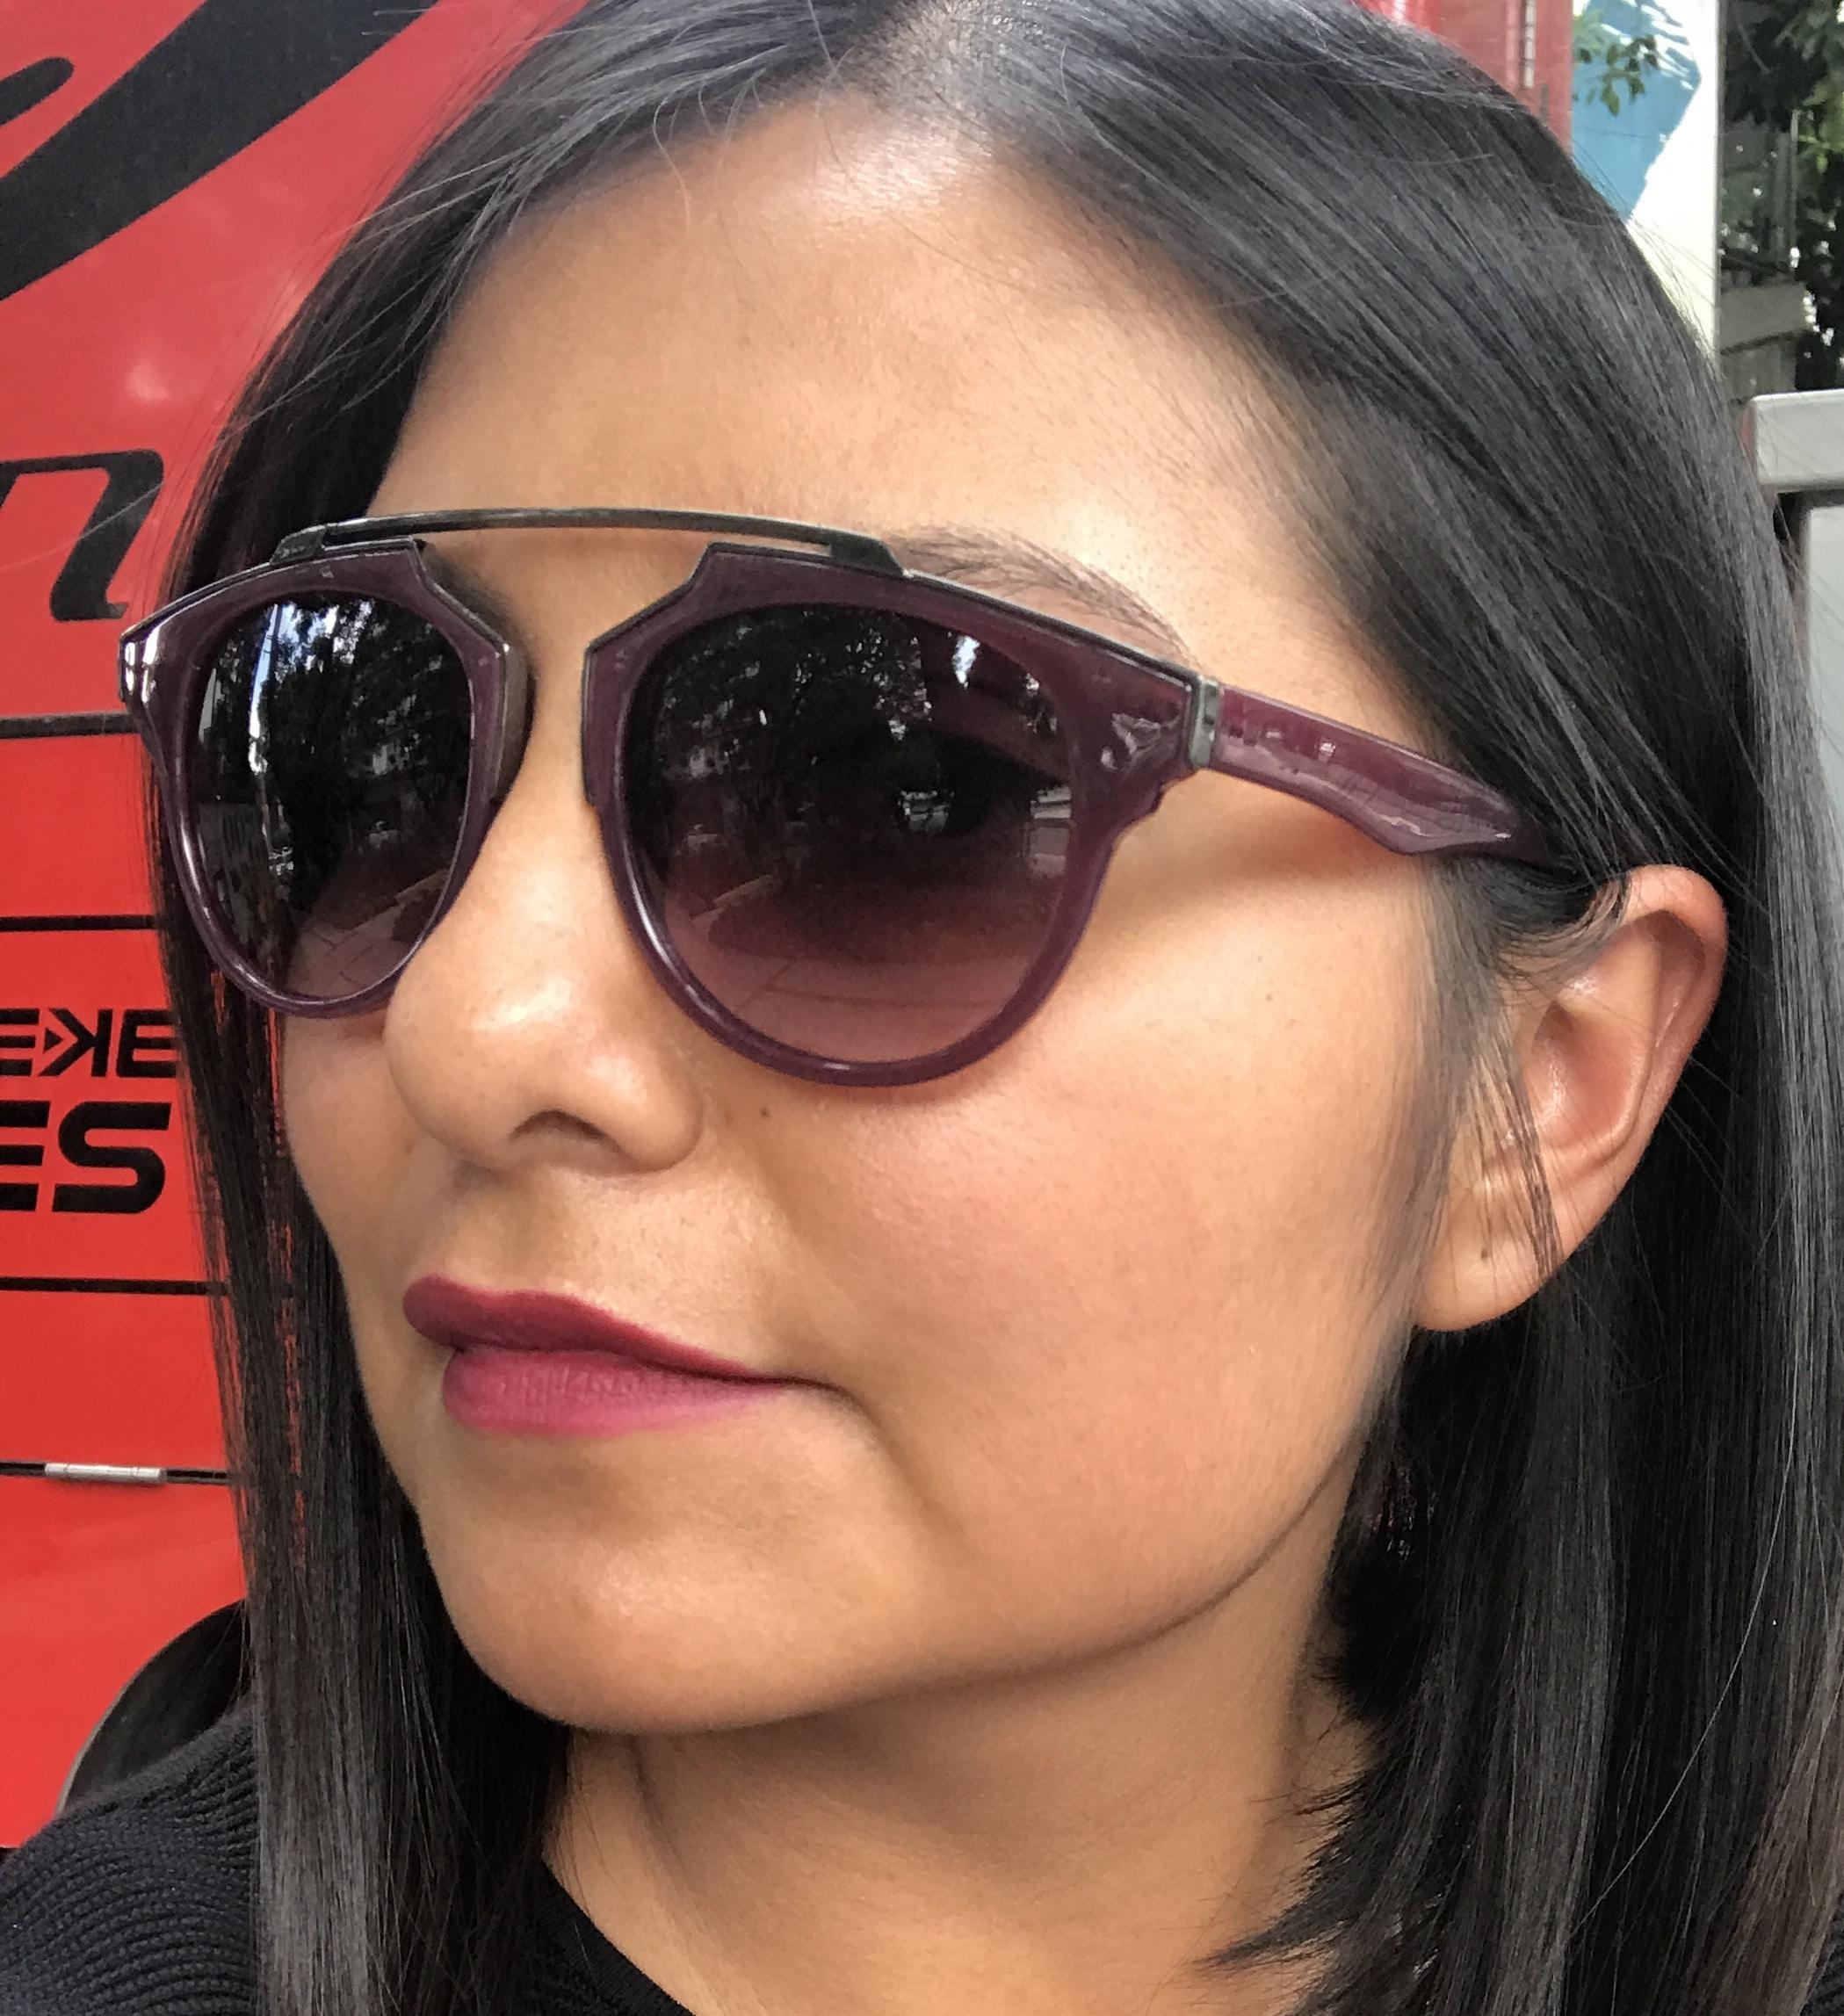 Go to Anahi Martinez's profile